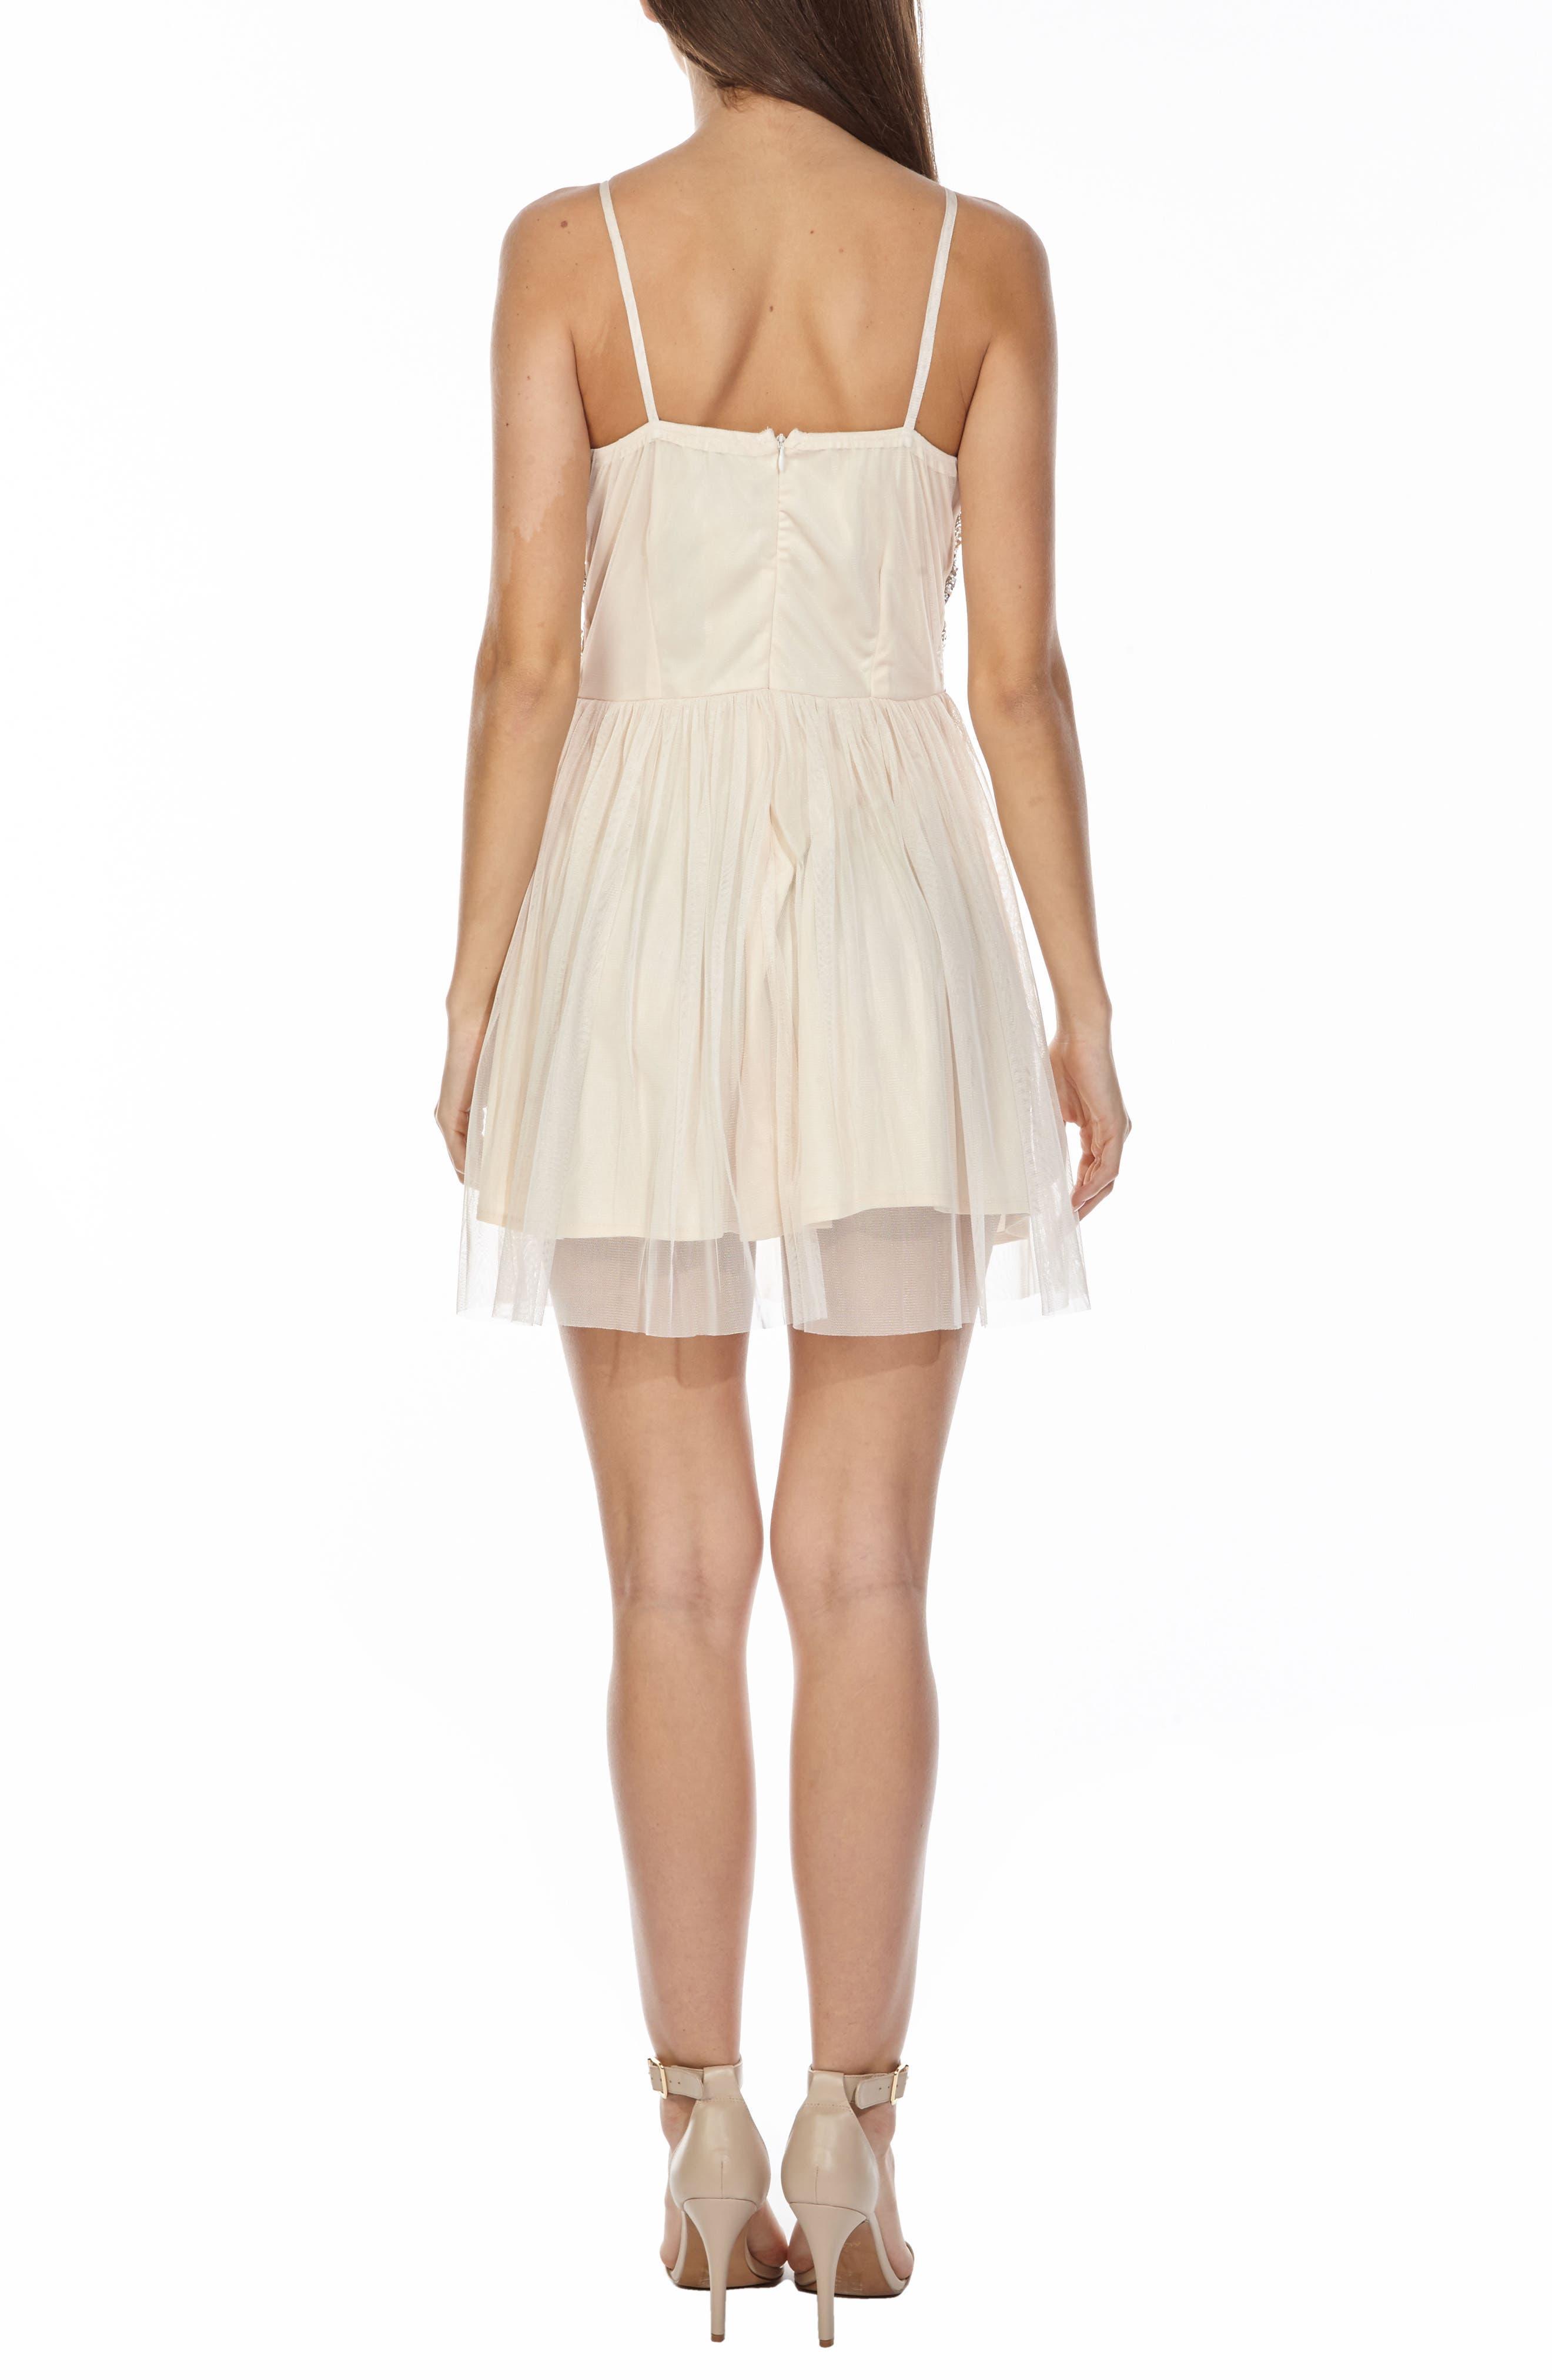 Peach Embellished Skater Dress,                             Alternate thumbnail 2, color,                             900